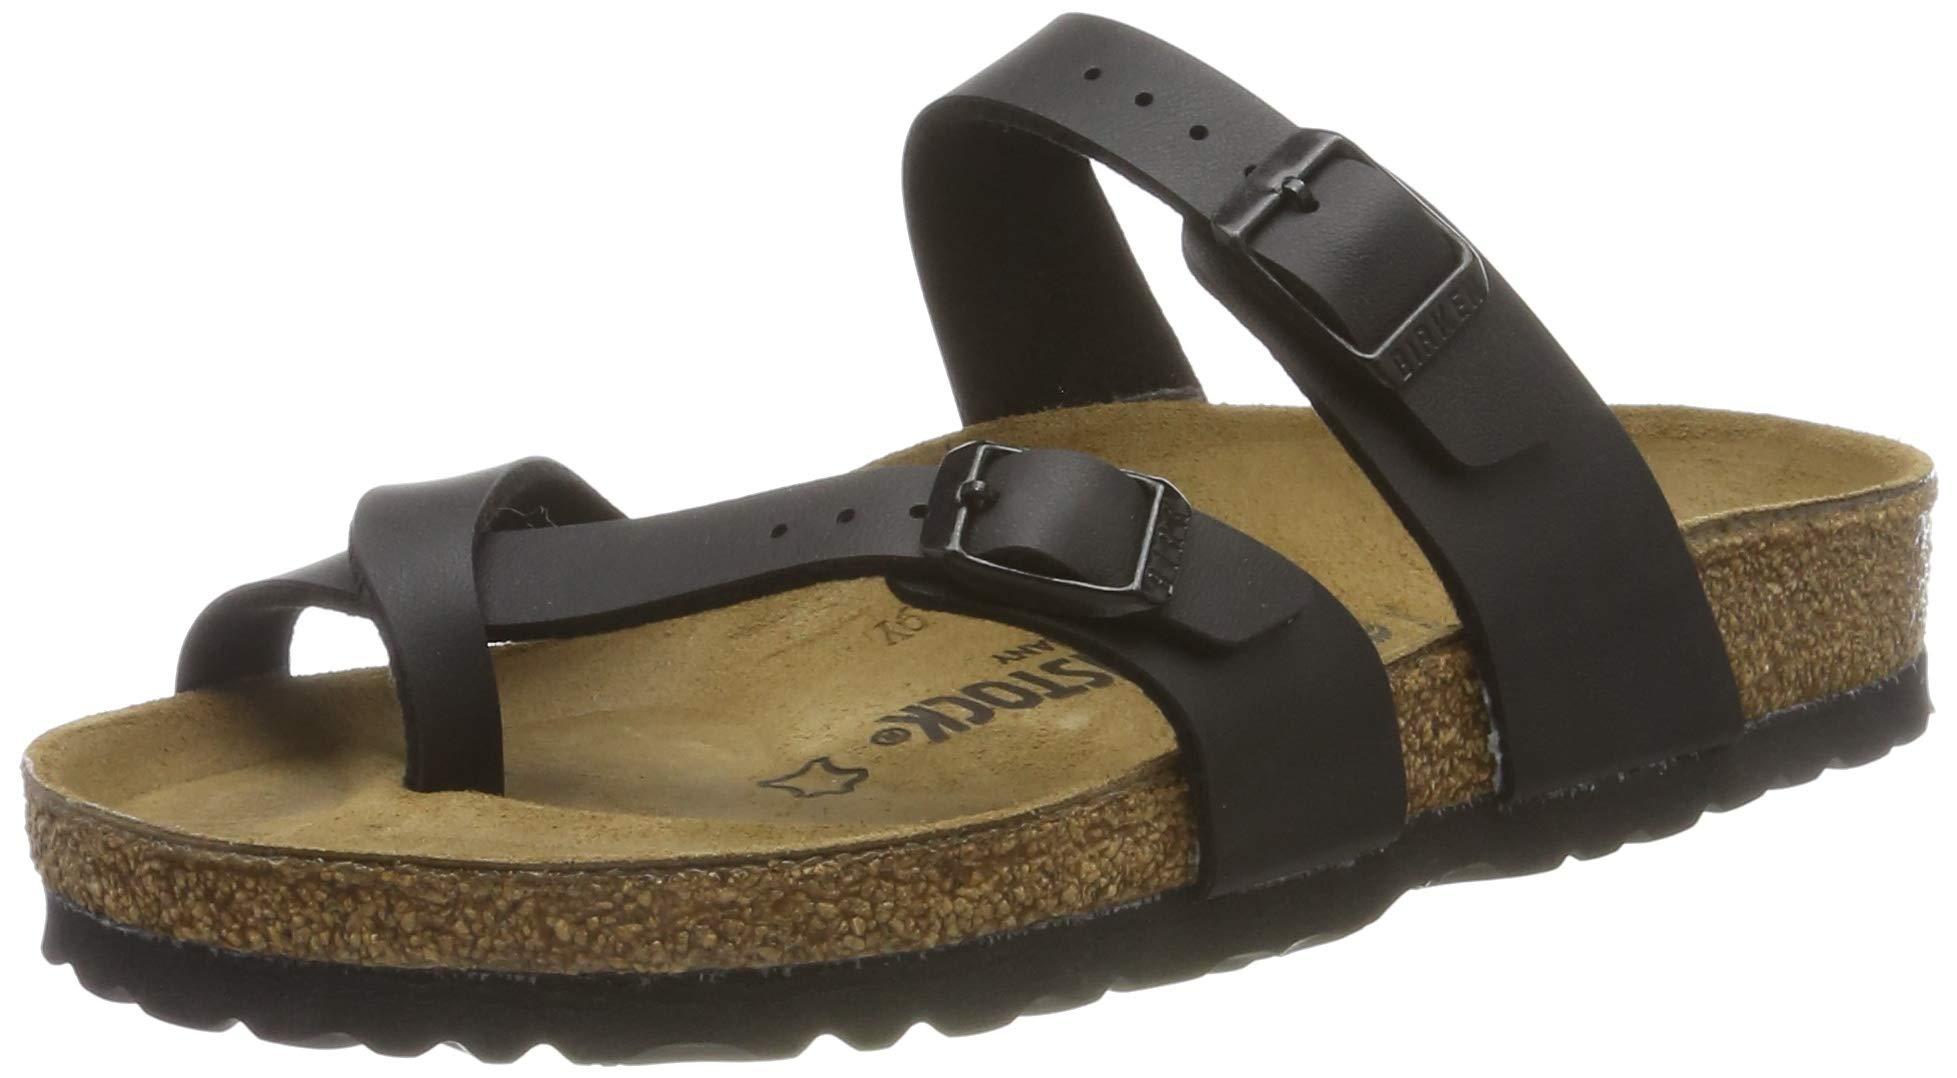 Birkenstock Women's Mayari Sandal,Black Birko-flor,40 EU/9-9.5 M US by Birkenstock